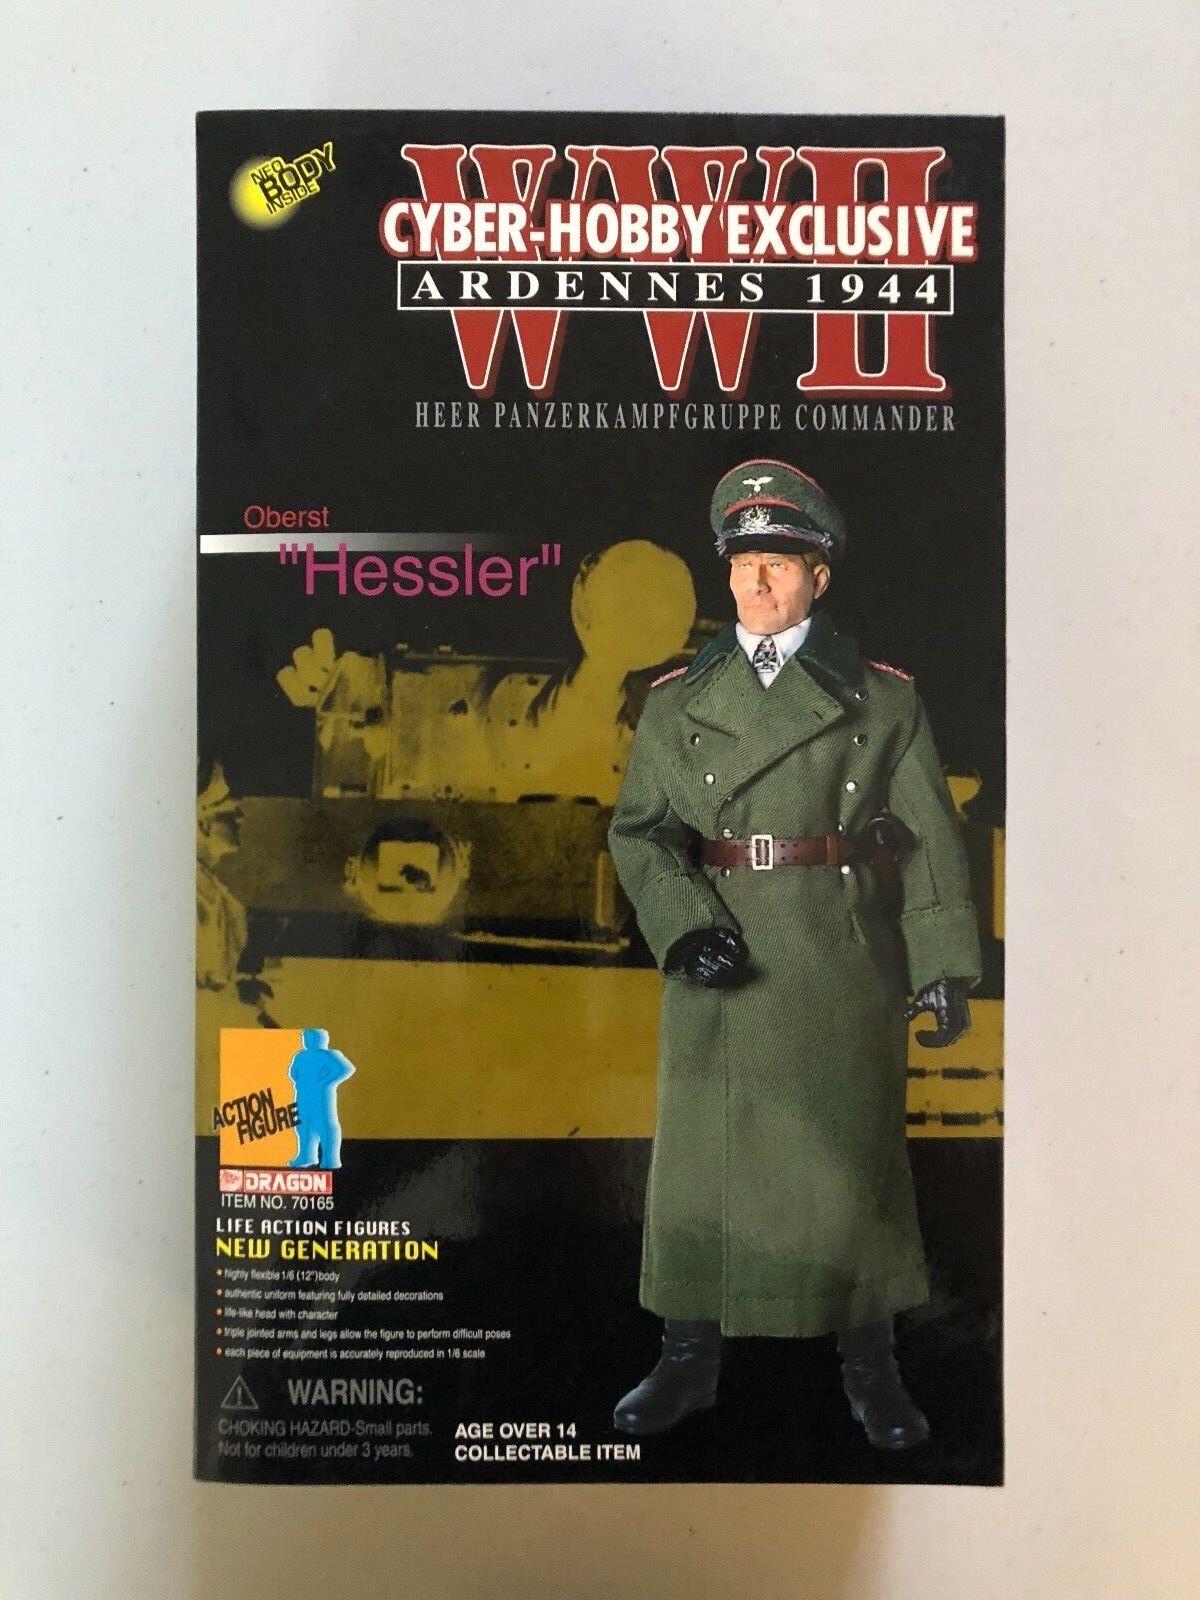 CyberHobby Heer Panzerkampfgruppe Comuomoder Oberst  Hessler   Ardennes 1944  Felice shopping